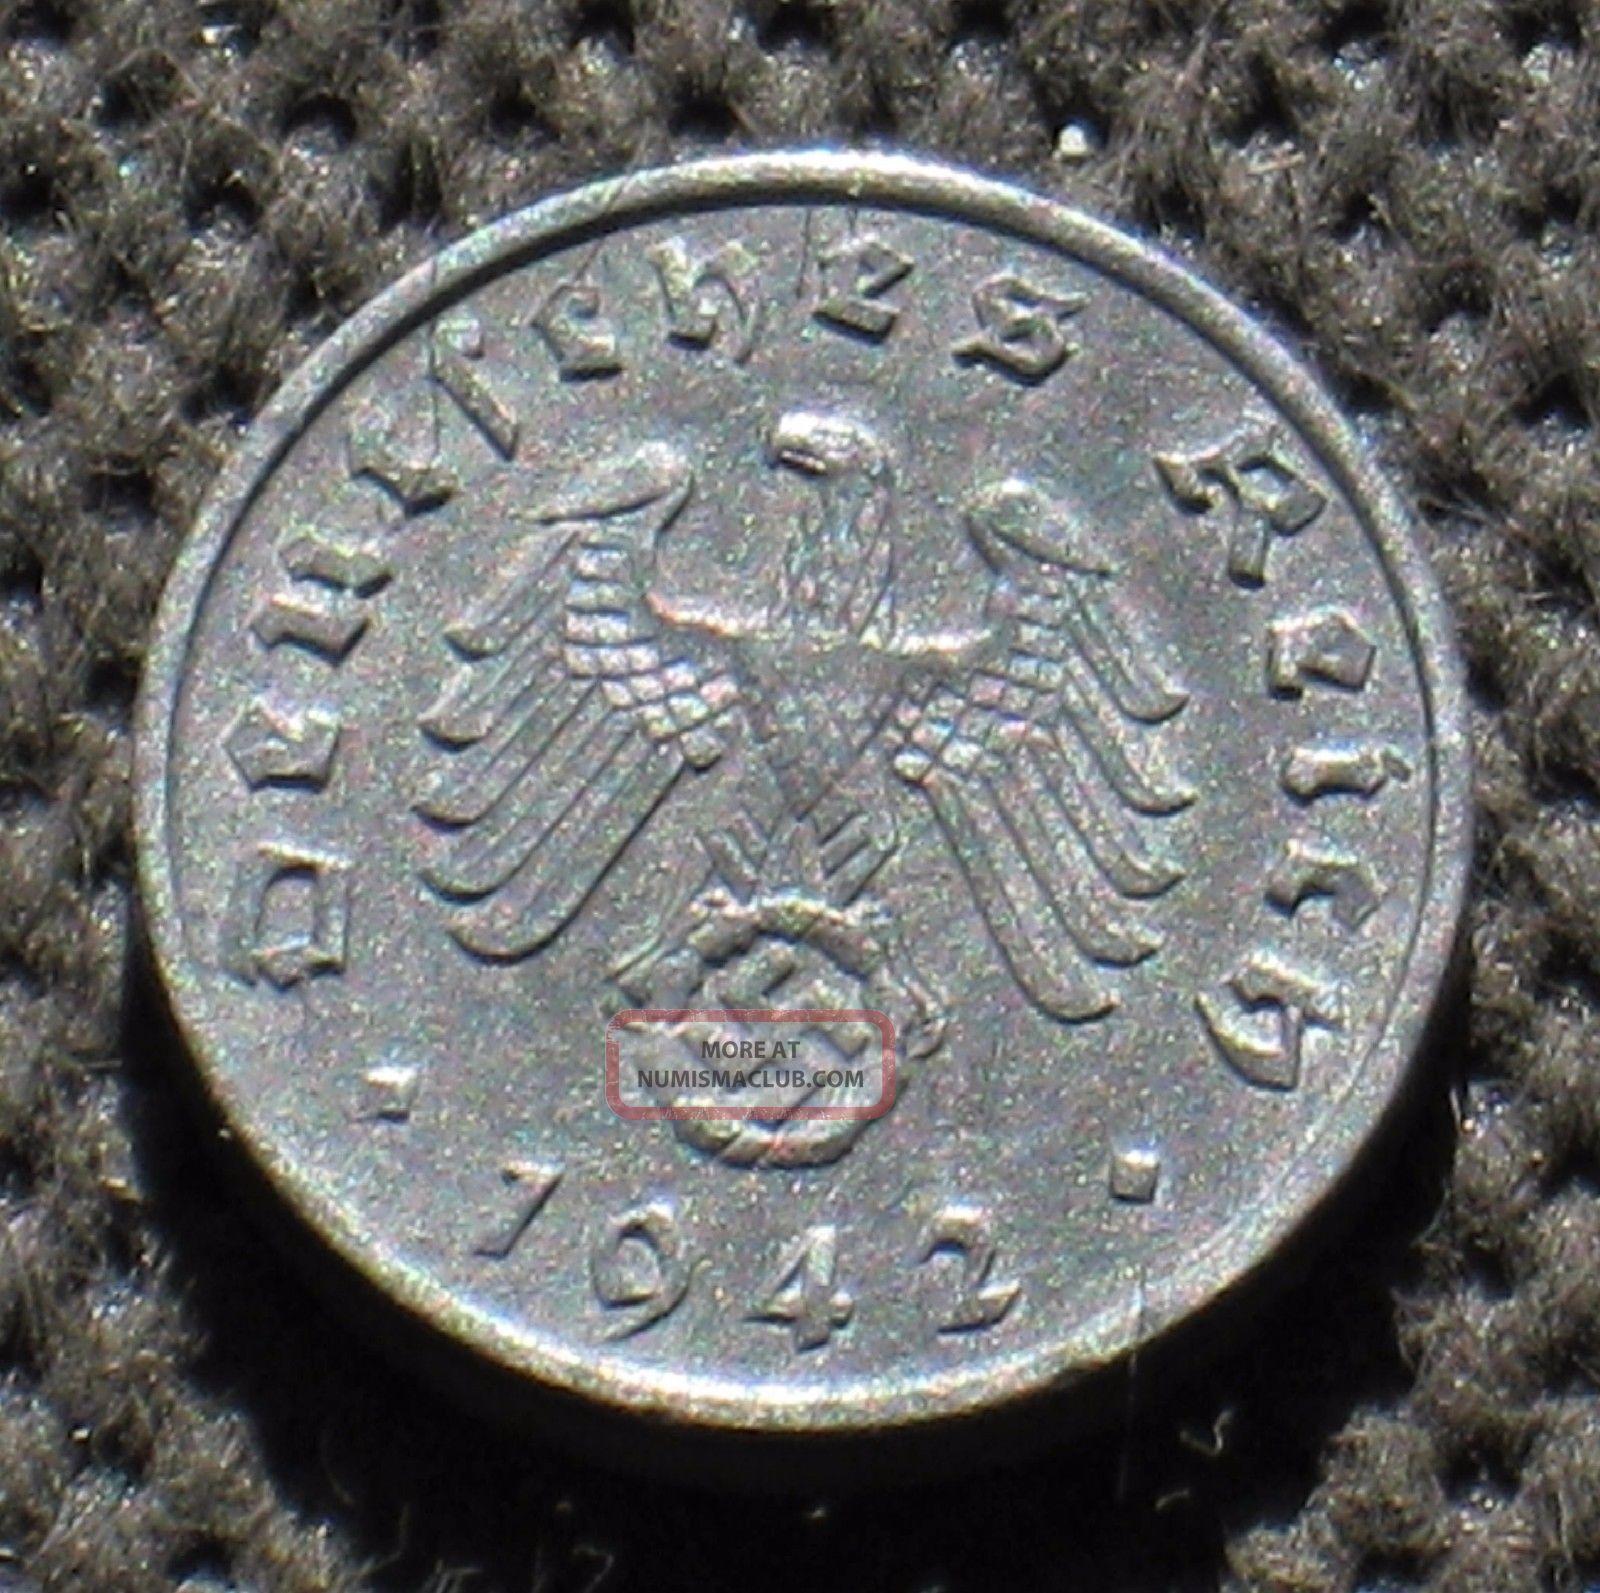 Rare Coin Nazi Germany 1 Reichspfennig 1942 A Berlin Swastika World War Ii Germany photo